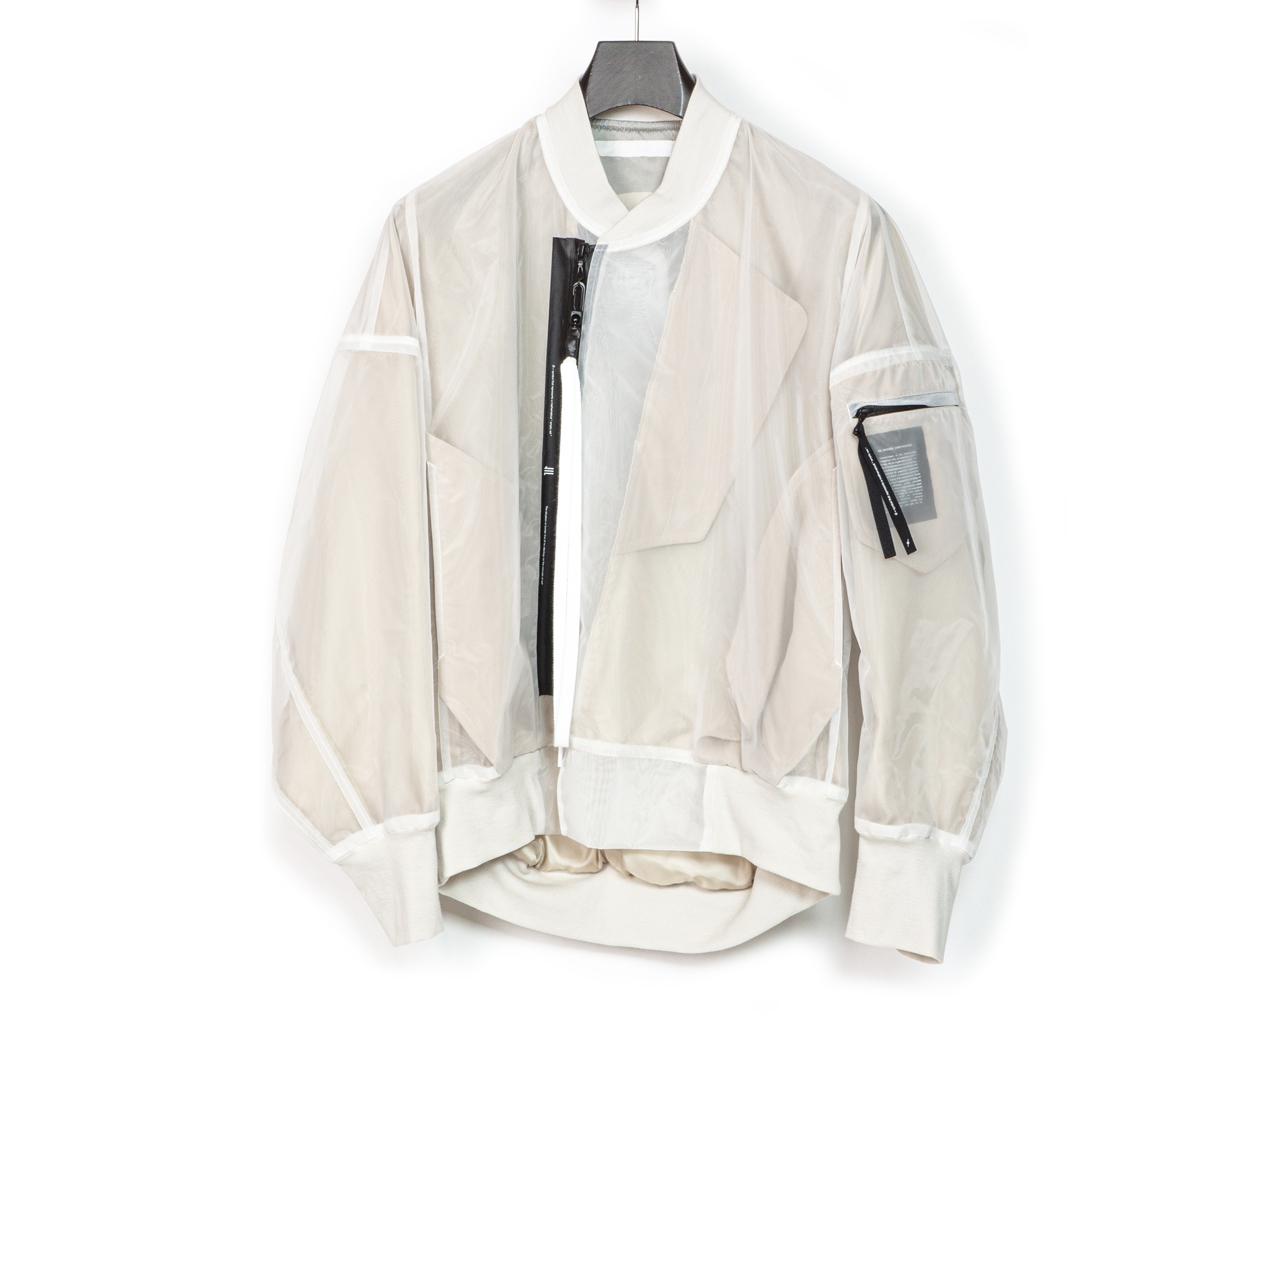 700BLM3-WHITE / Jesse Draxler バックプリントボンバージャケット